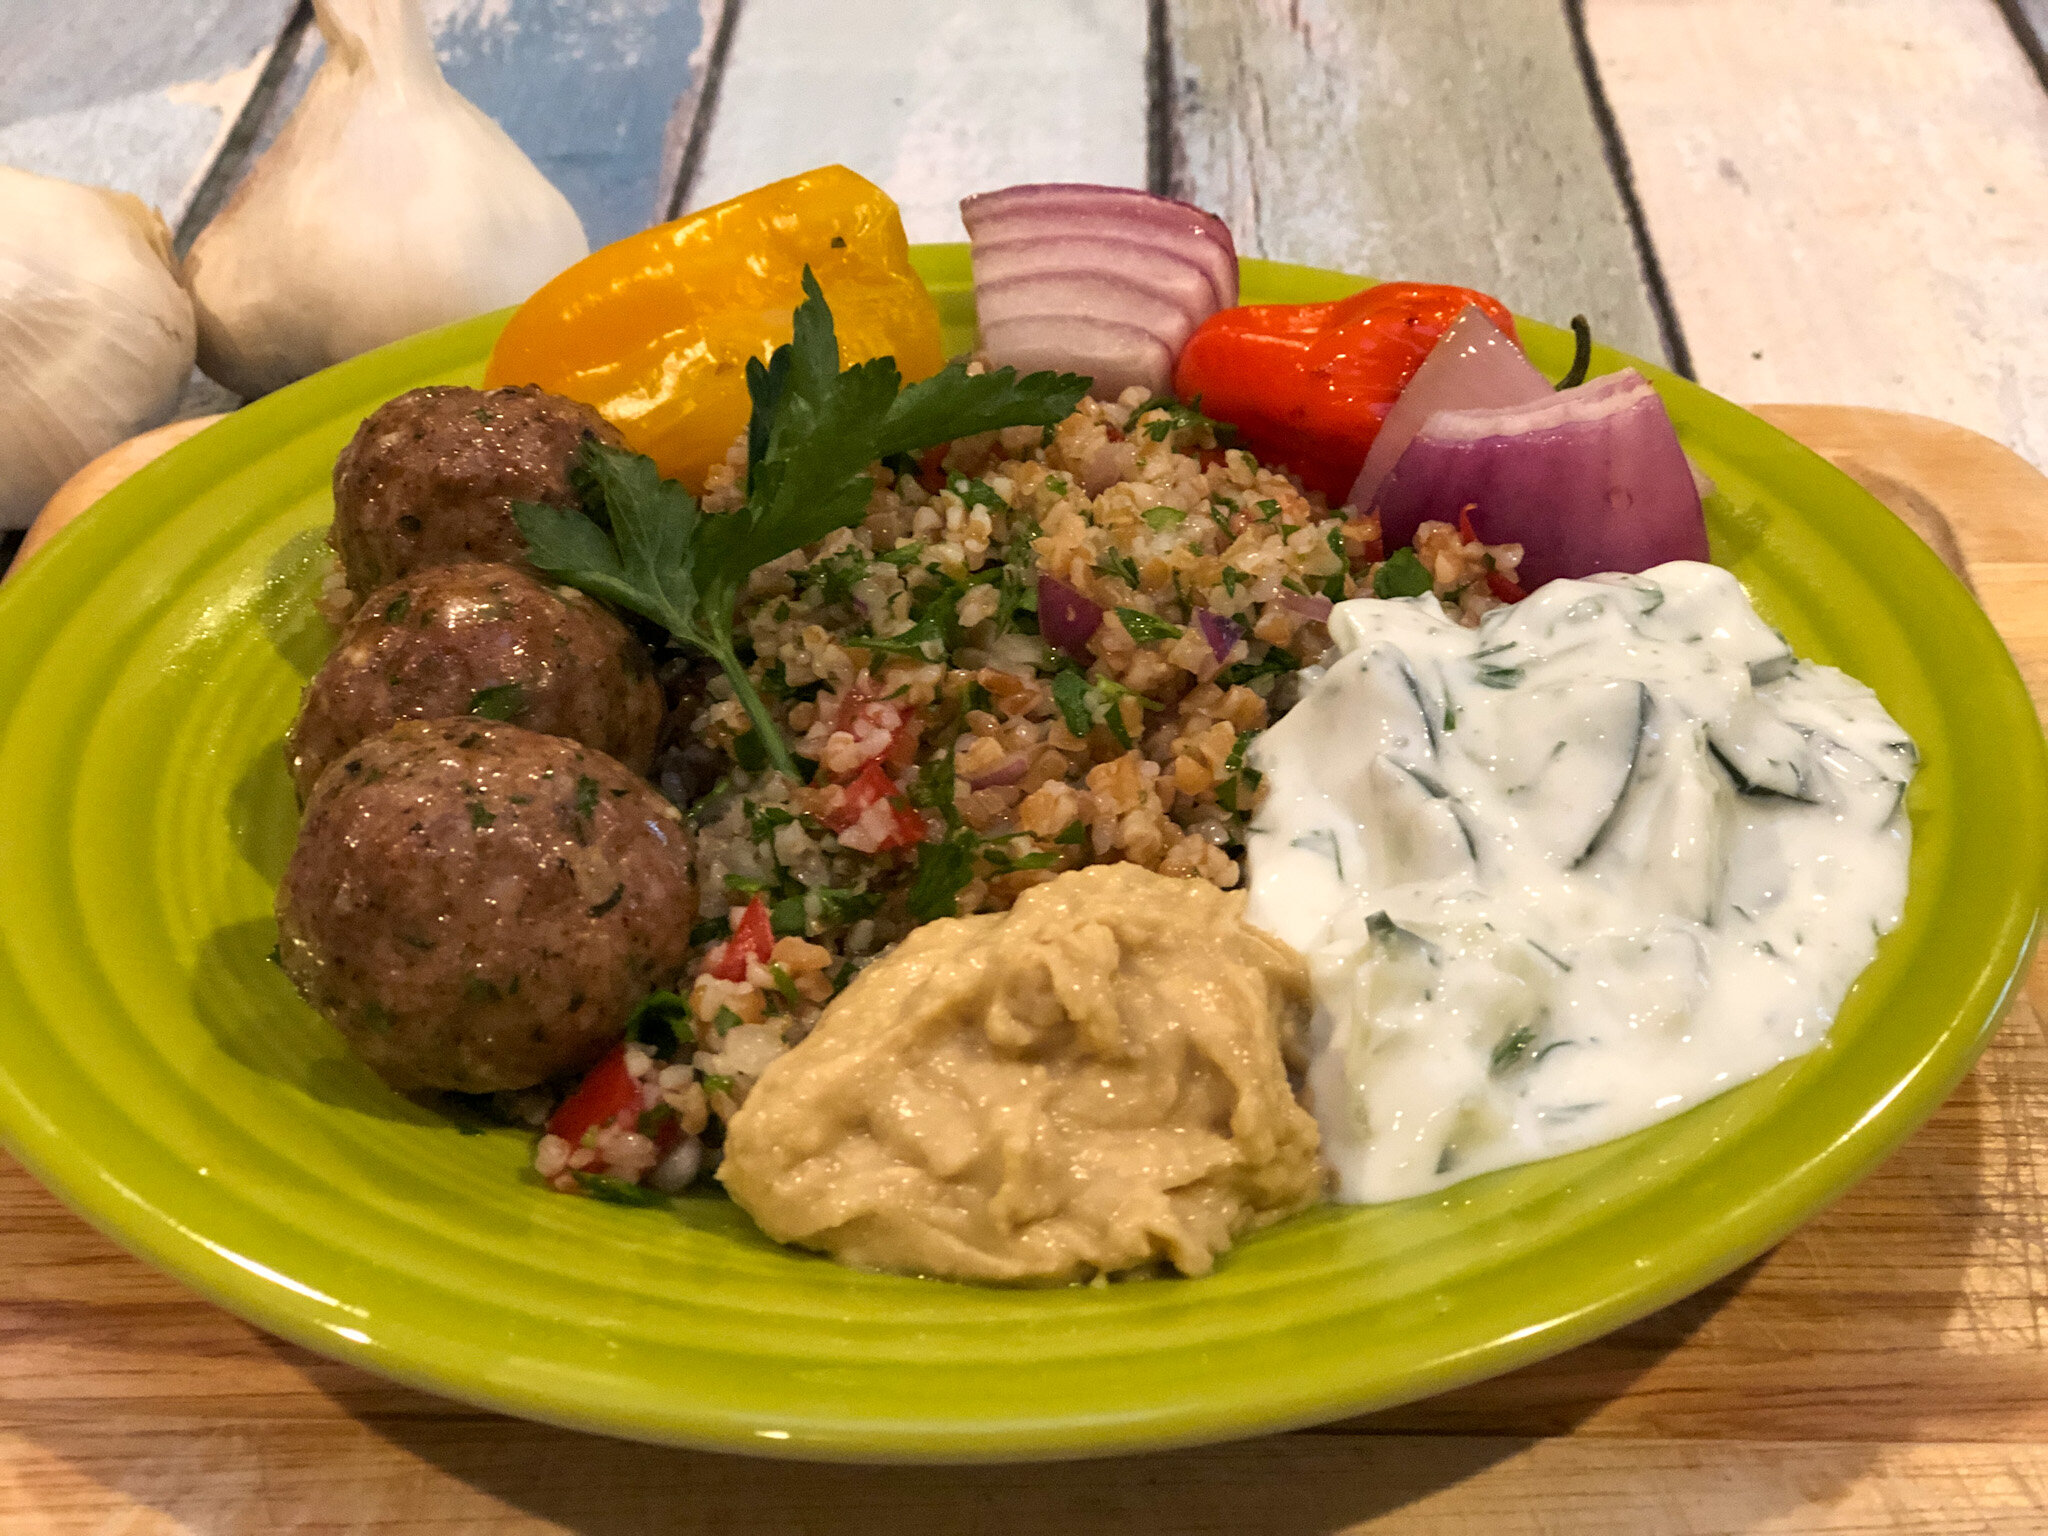 Fat-Free Tzatziki as a side dish to Mediterranean Meatballs.